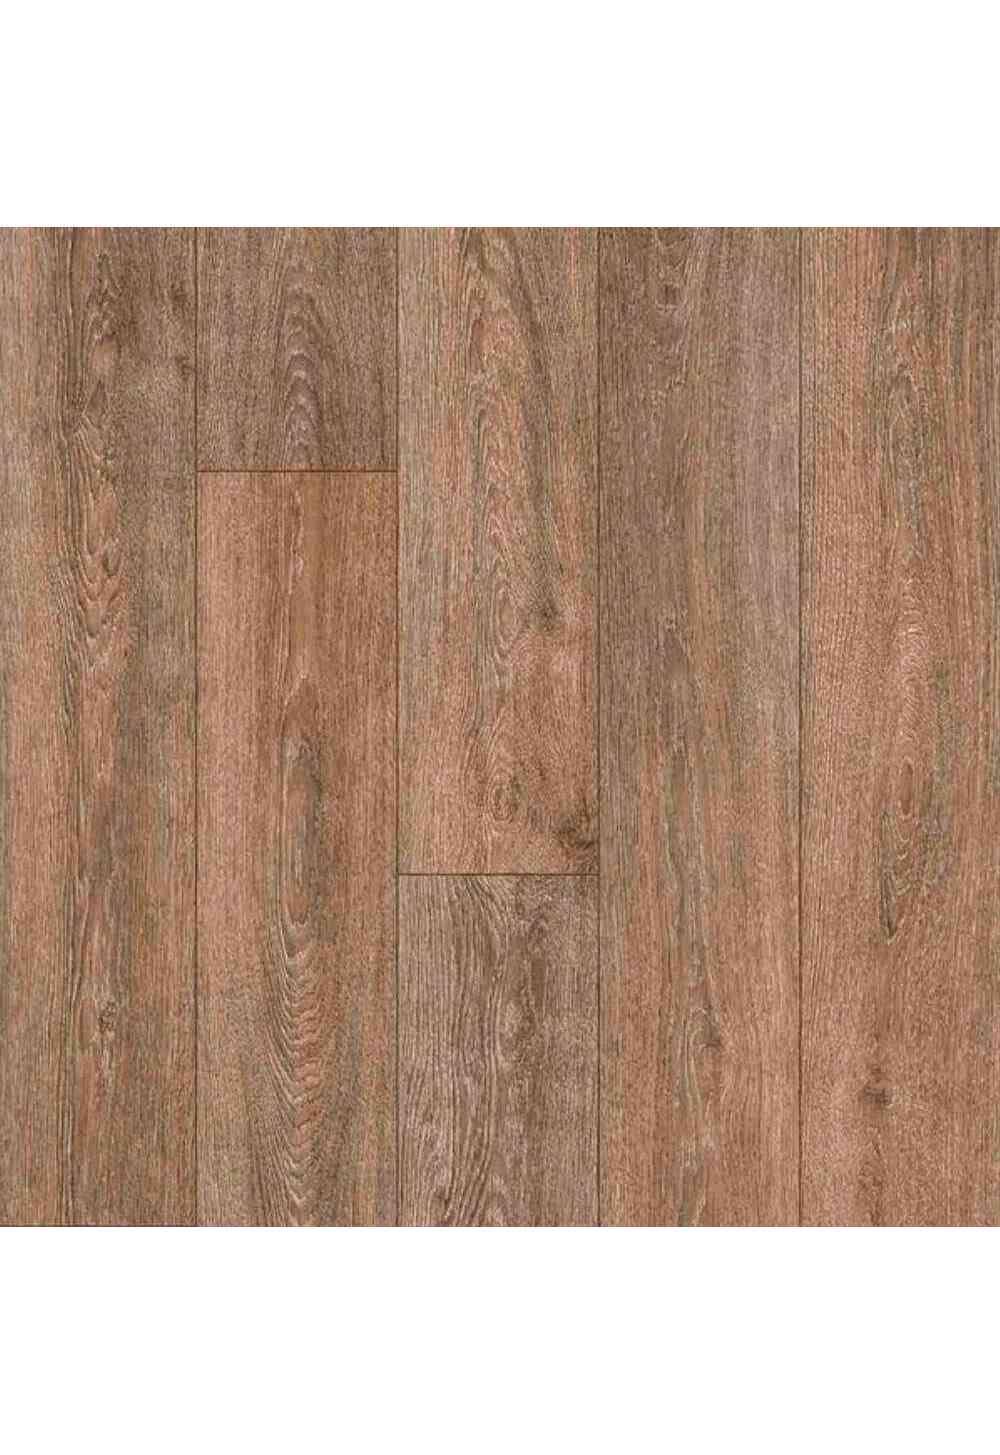 Лінолеум IDEAL IMPULSE Indian Oak 4